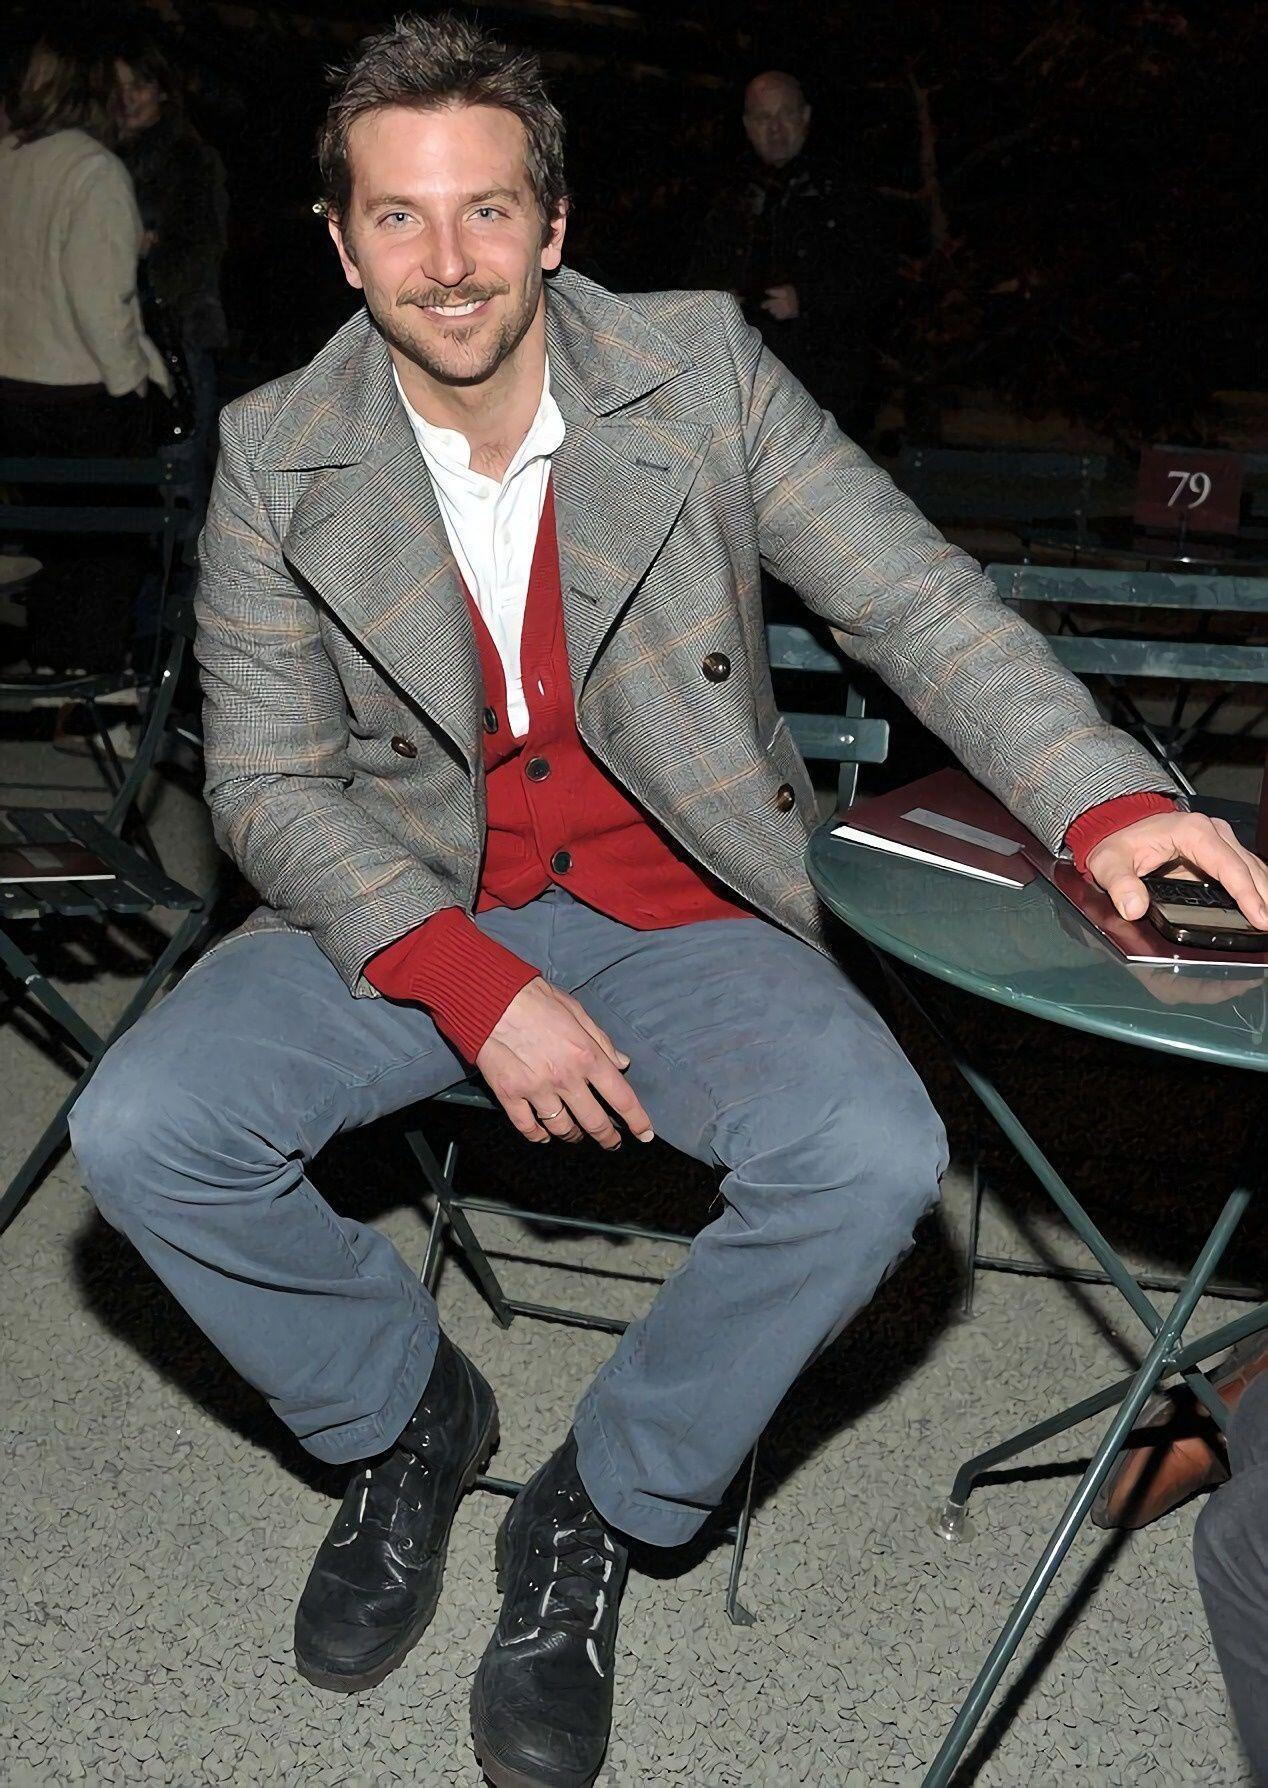 9 Gaya Outfit ala Bradley Cooper, Manly Abis Nih!